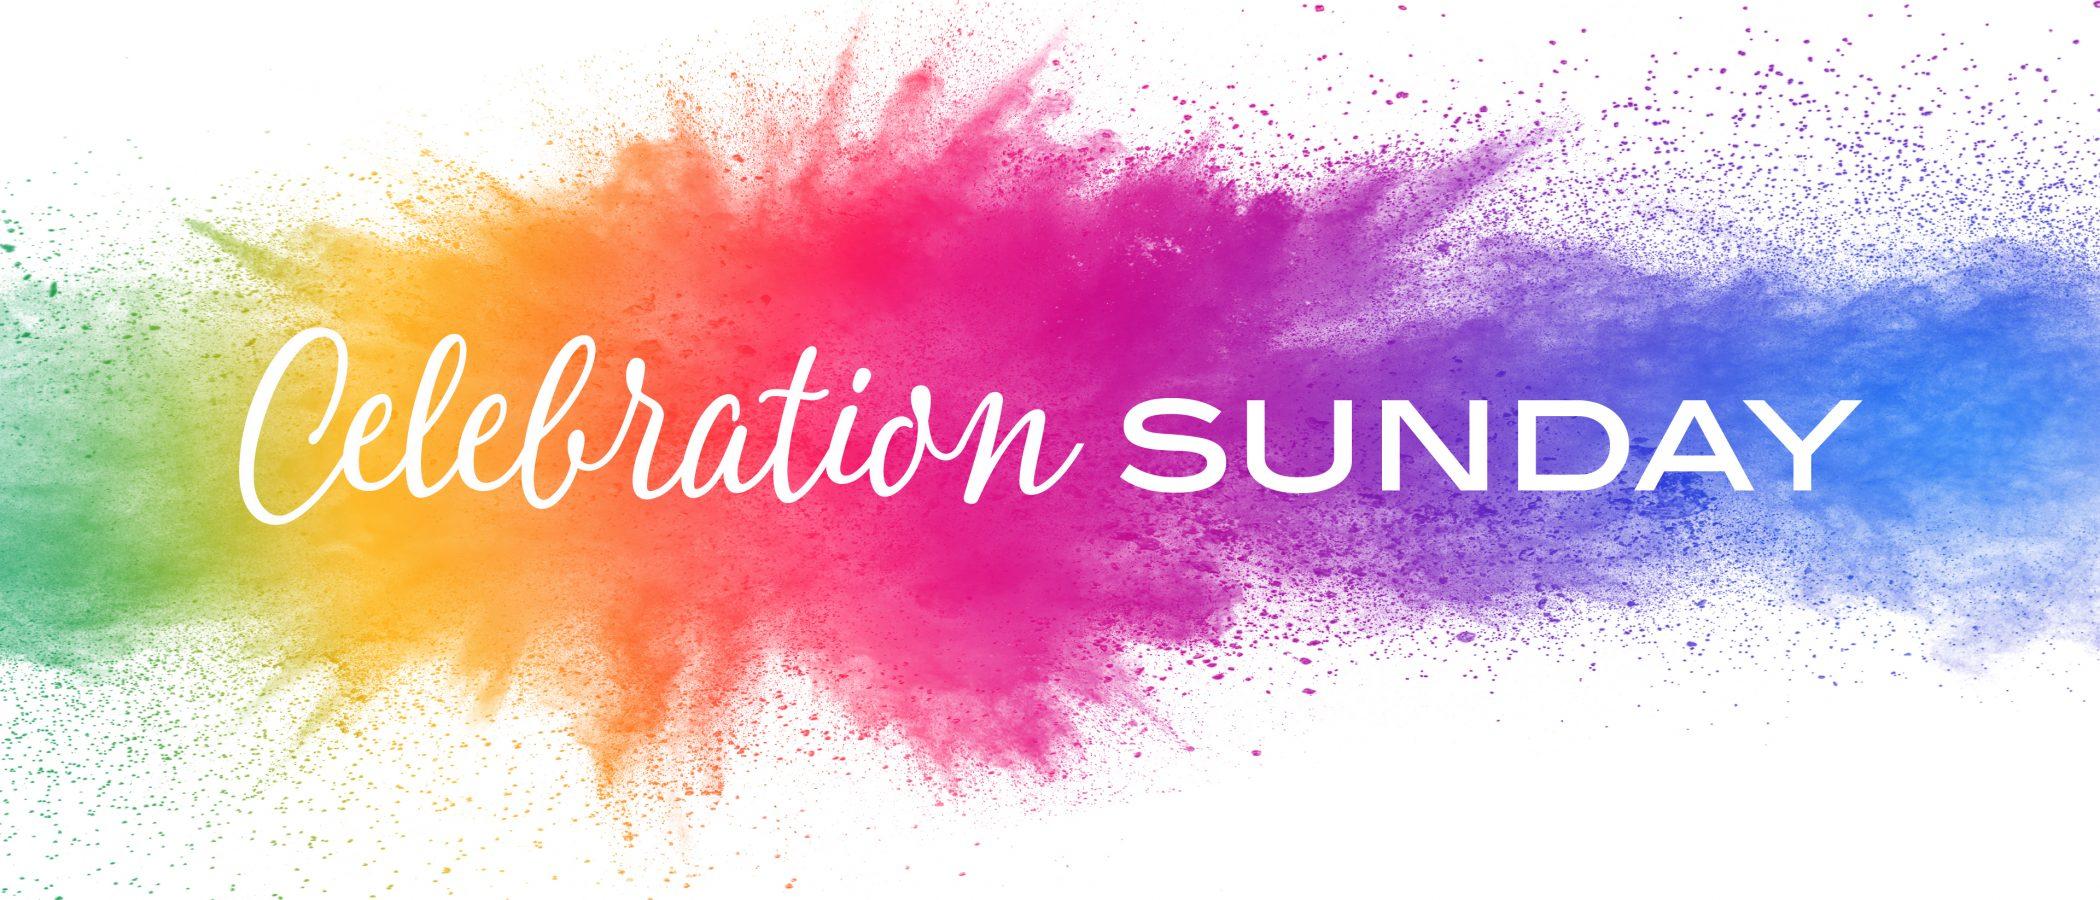 celecbration-sunday-11brd-dq2021-web-banner2x-100